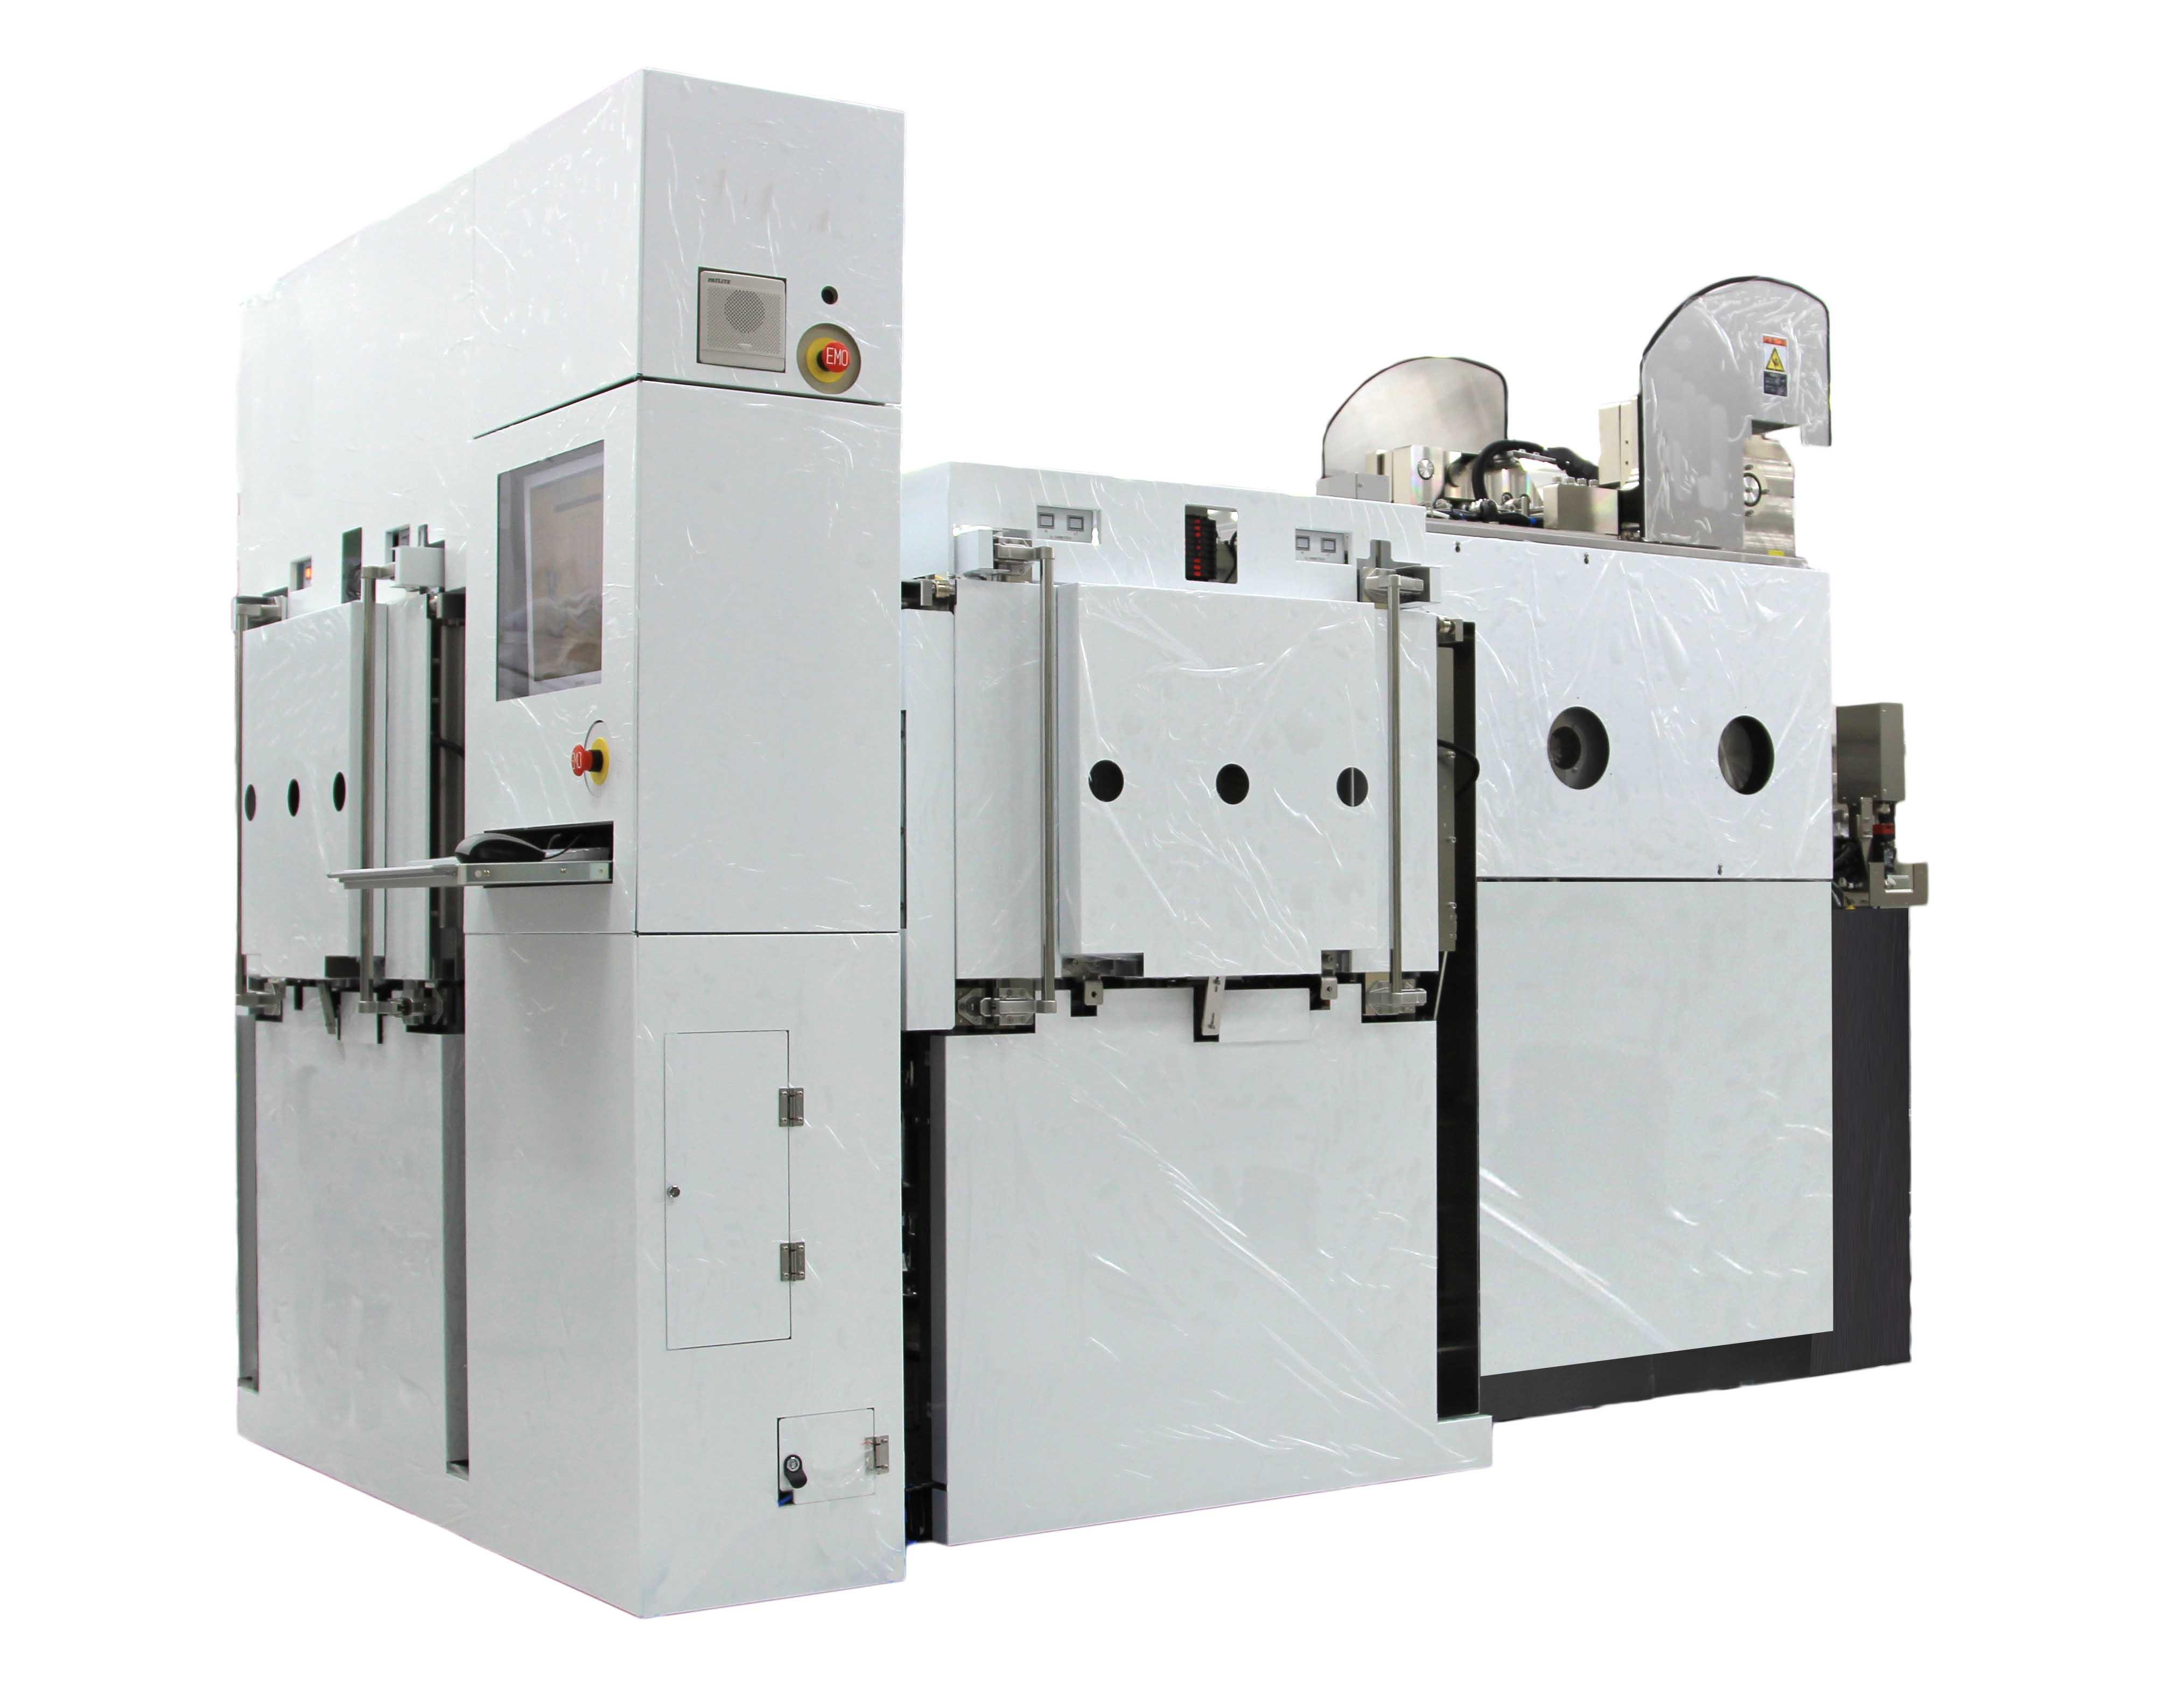 BC7000 Atomic Diffusion Bonding System 11 5 18